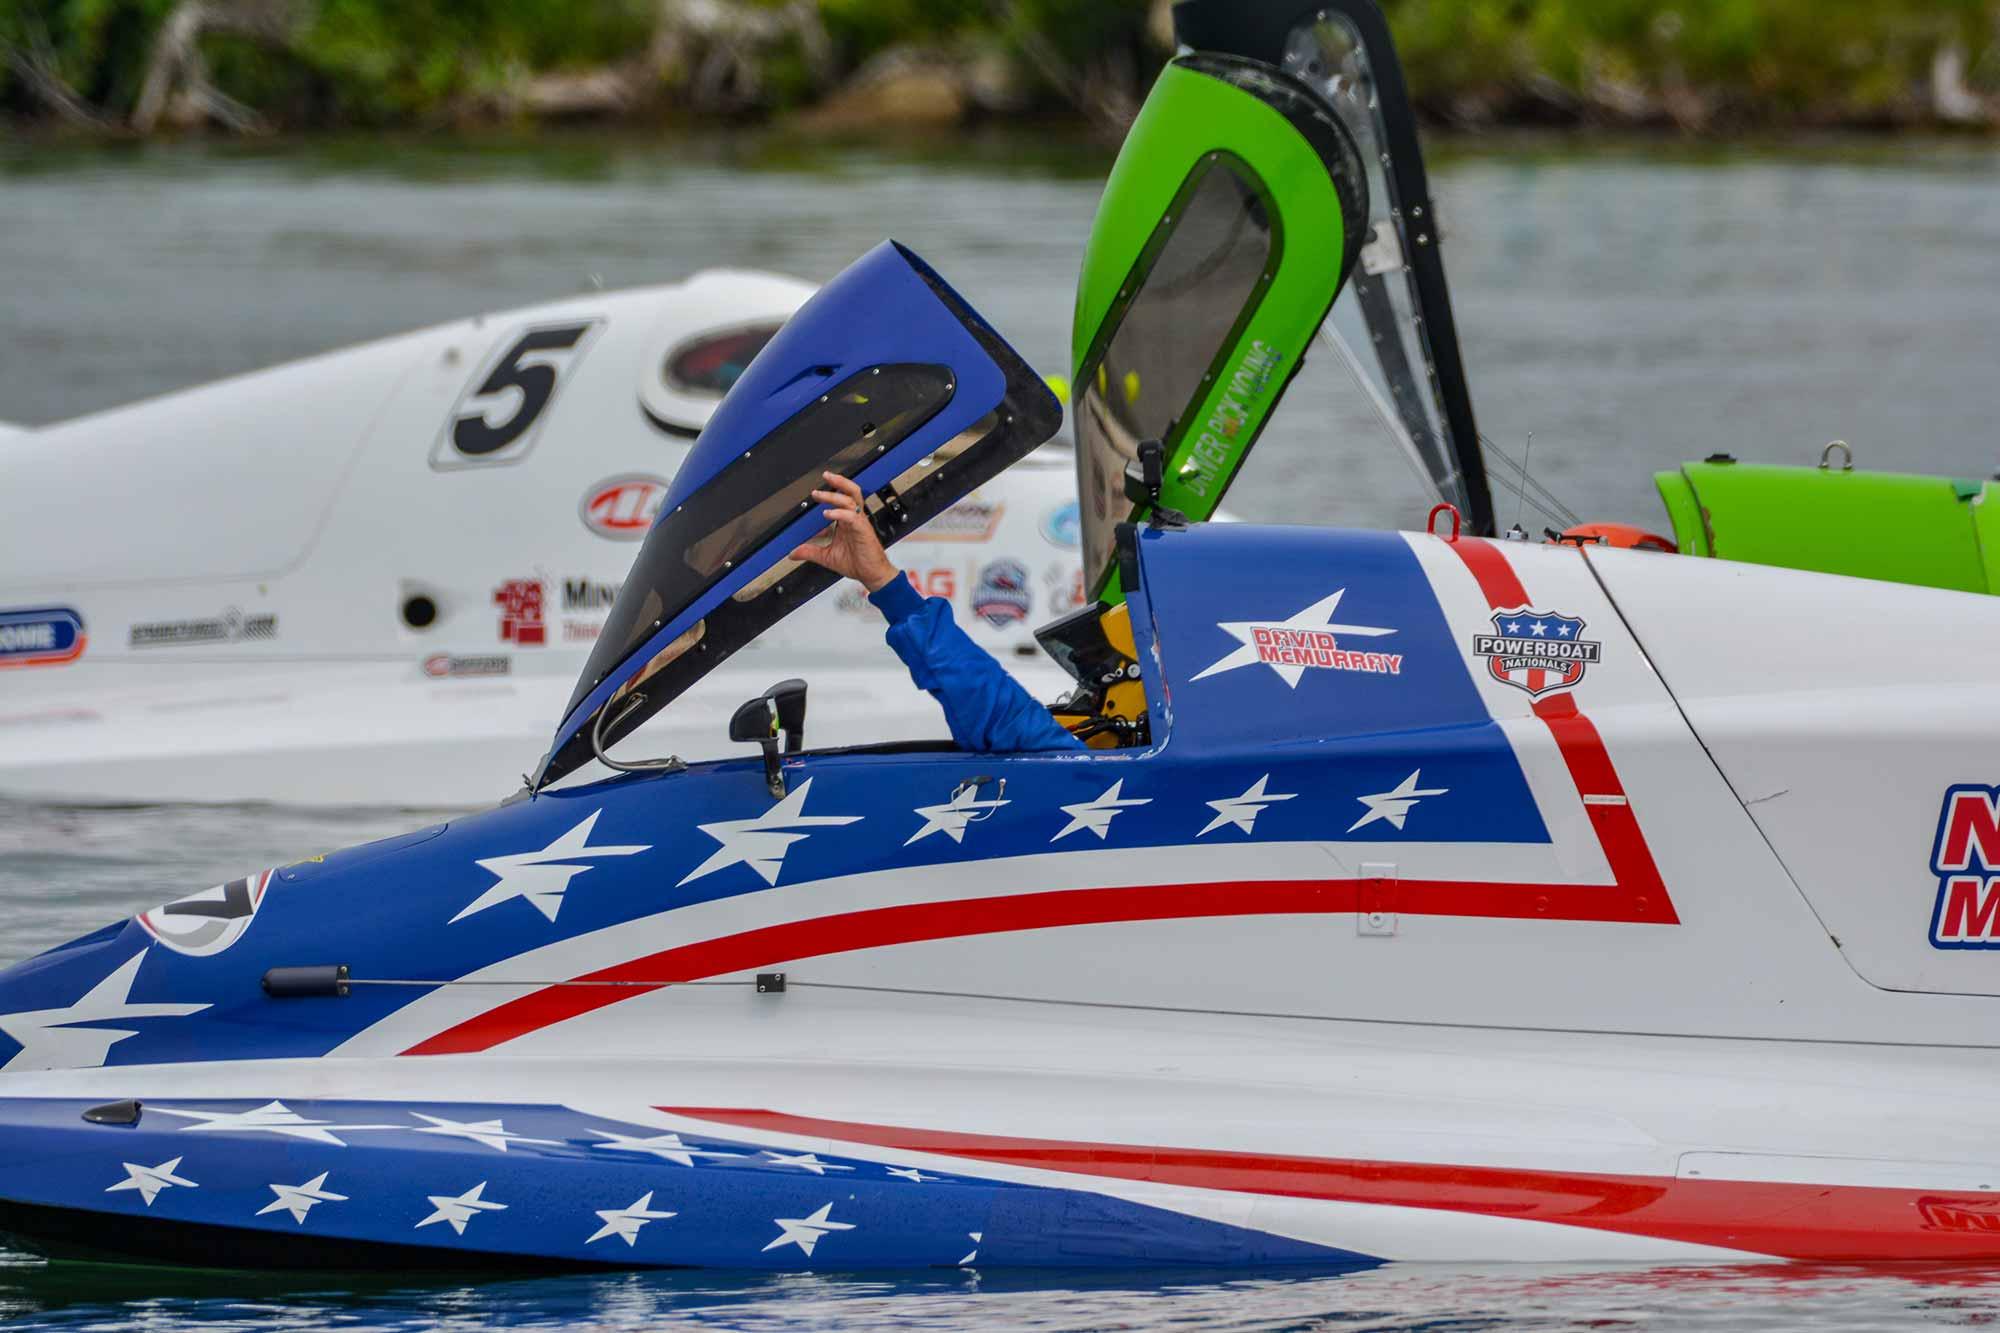 McMurray-Racing-Nashvill-Marine-2021-Springfield-F1-Race-26